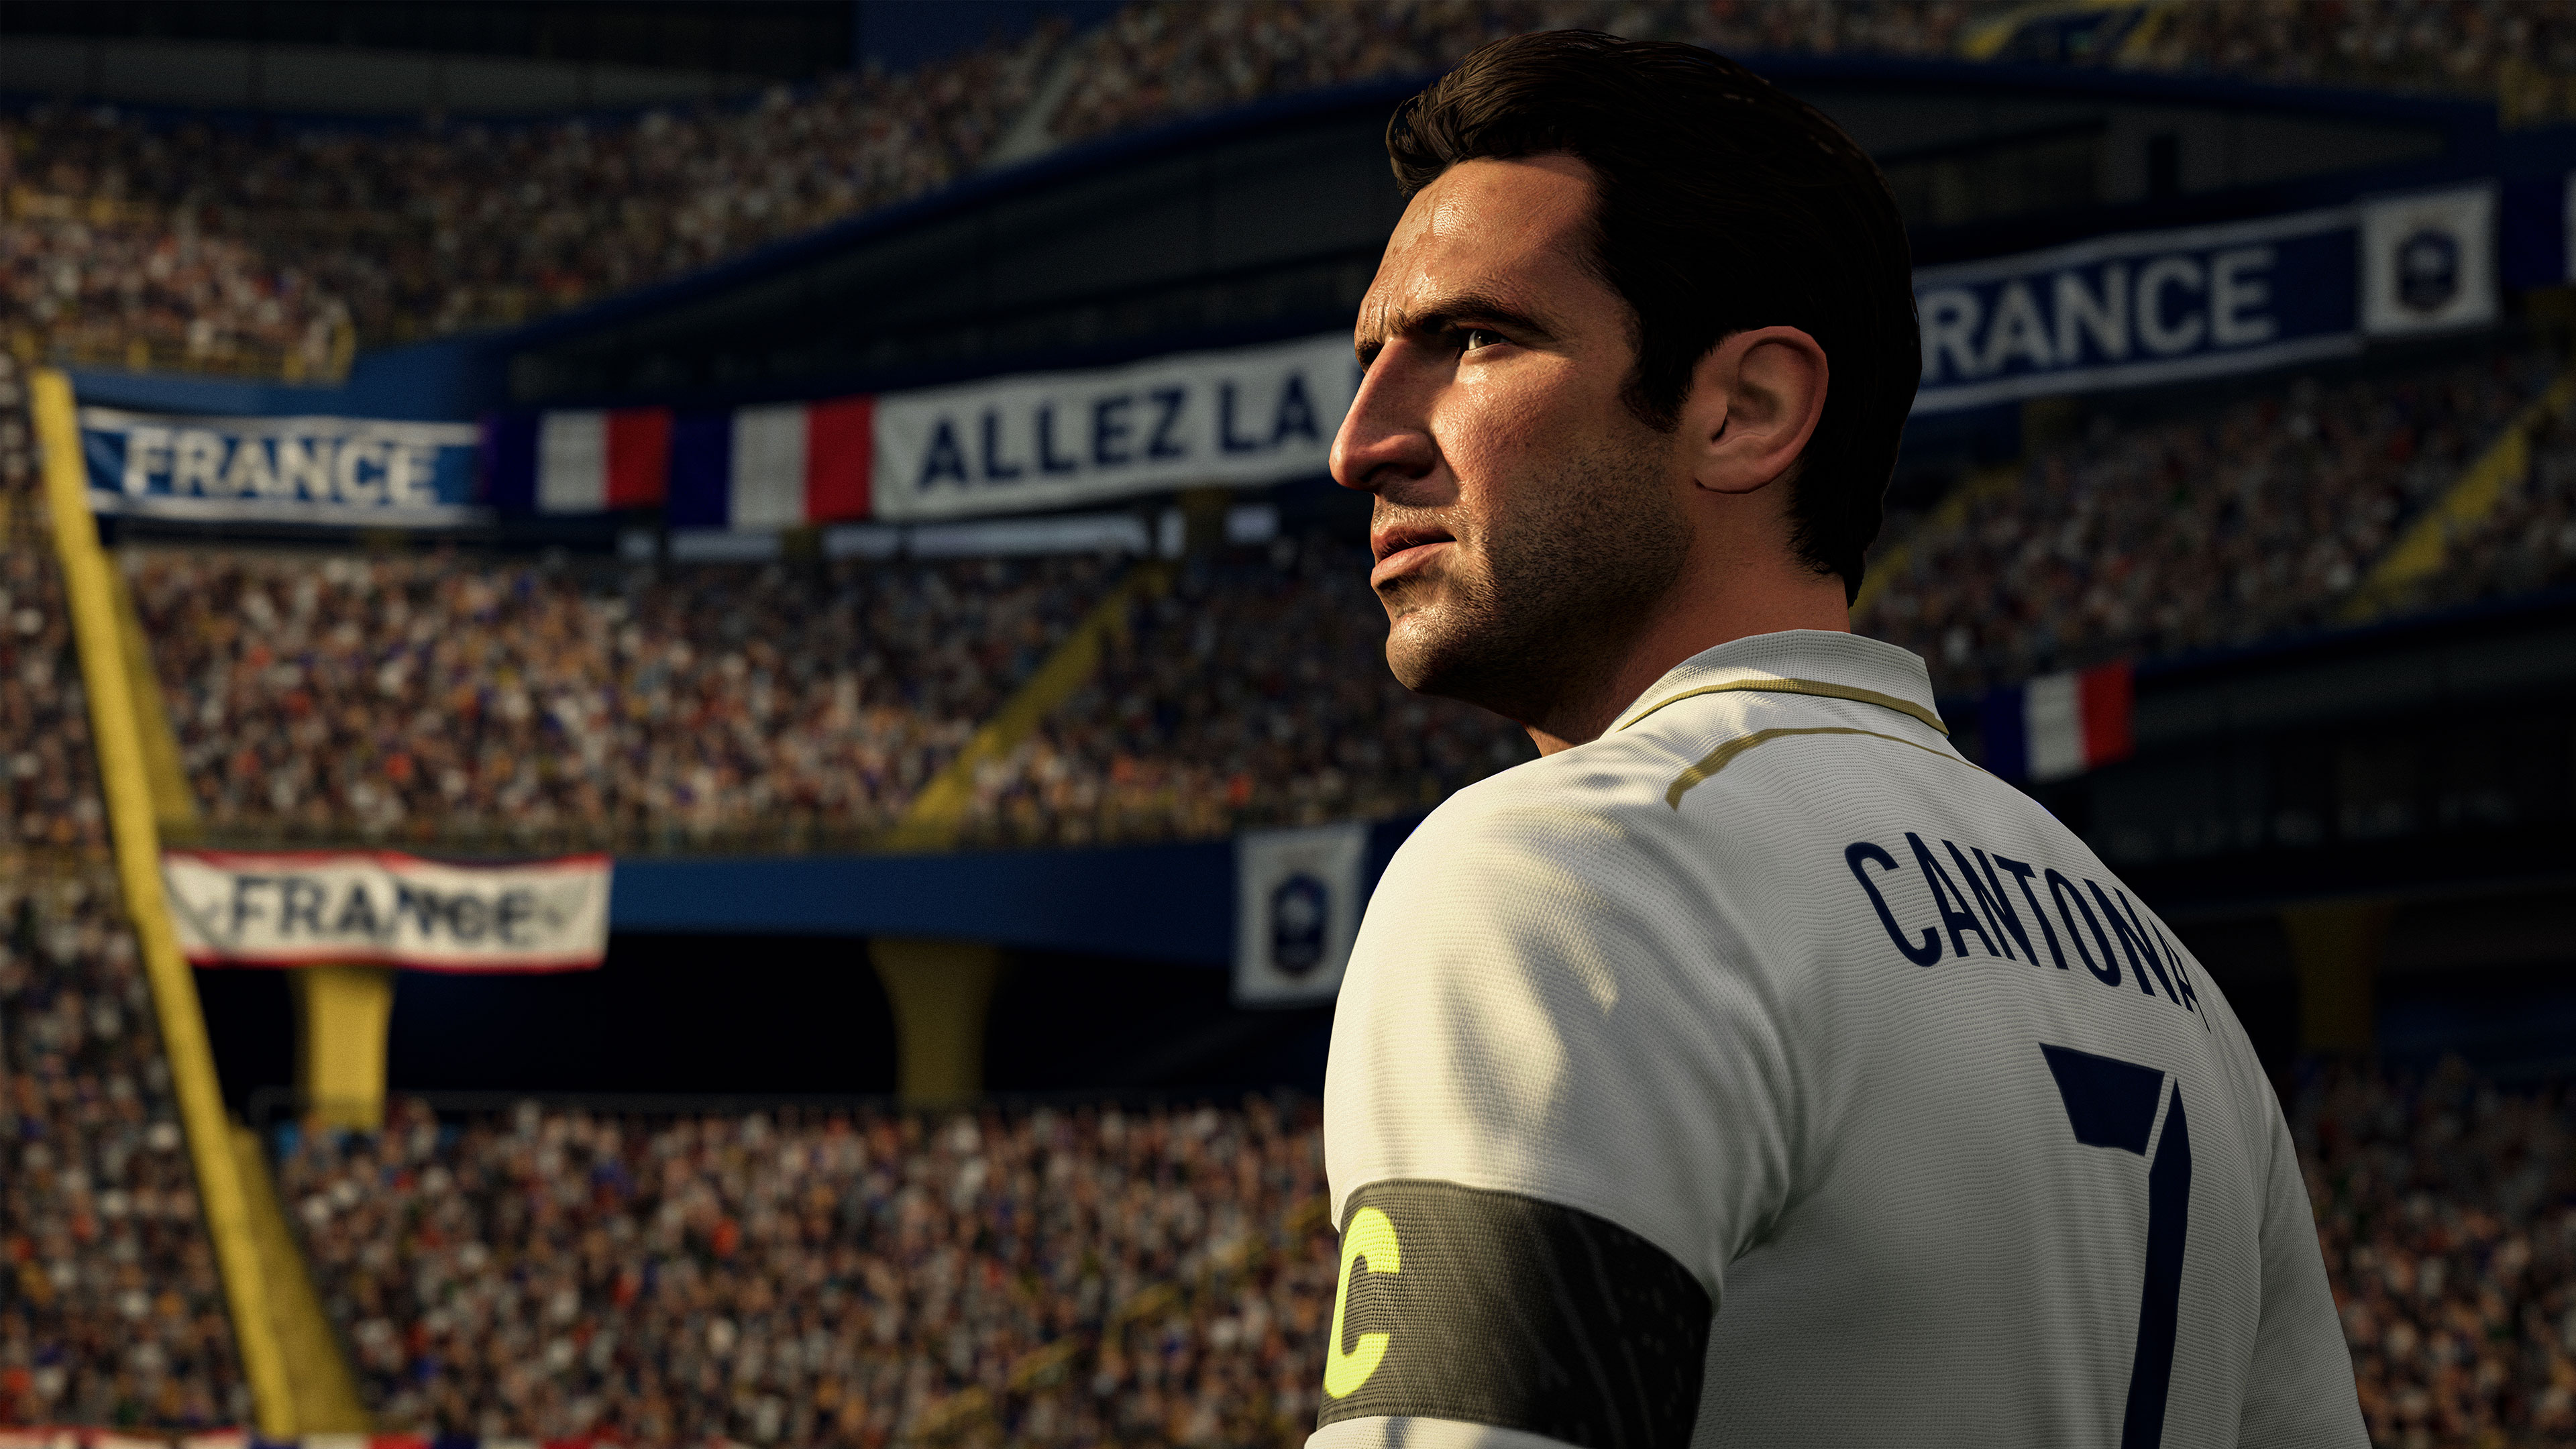 Скриншот №1 к FIFA 21 стандартное издание PS4 and PS5